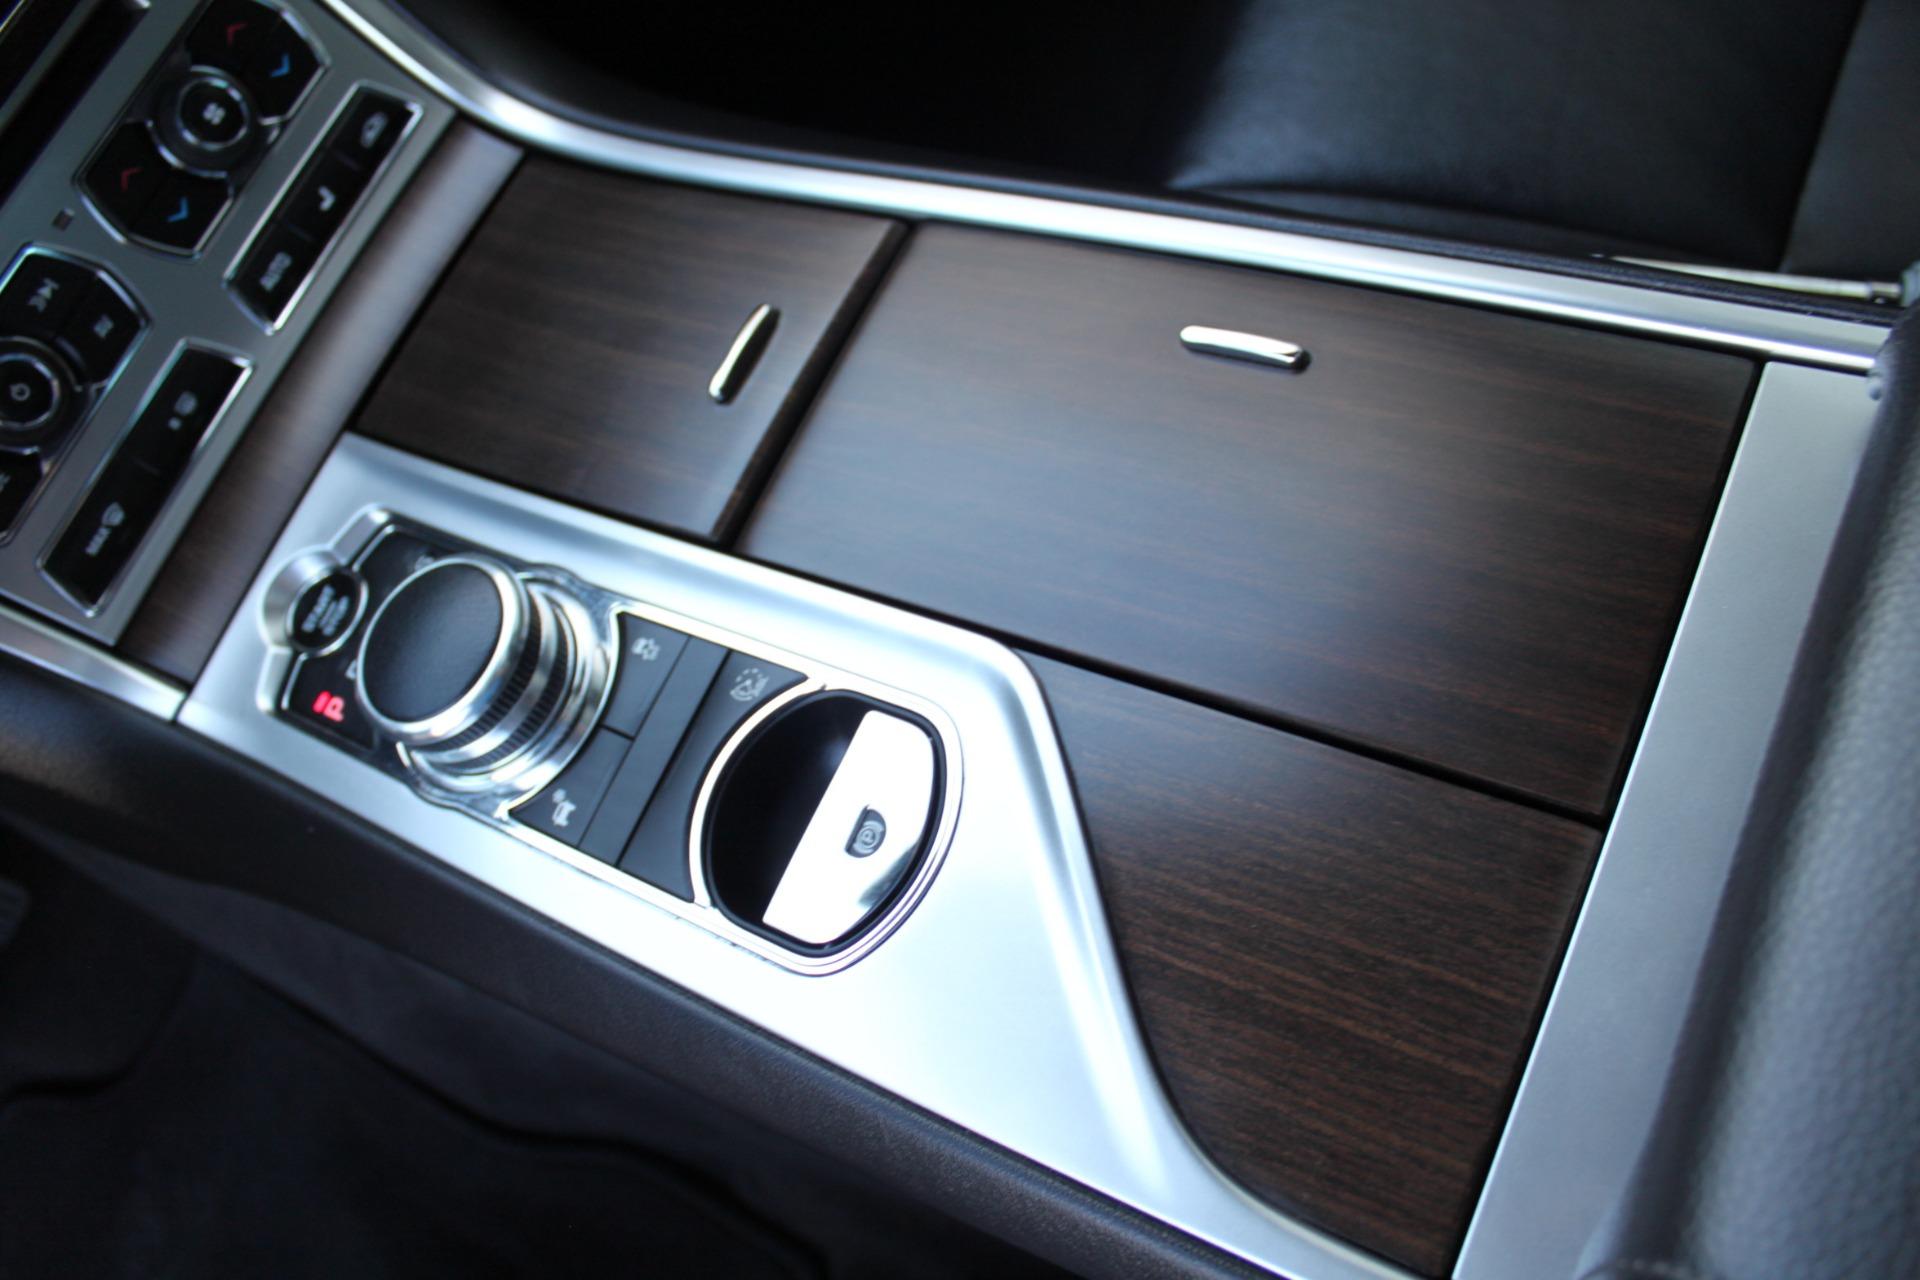 Used-2013-Jaguar-XF-I4-RWD-Range-Rover